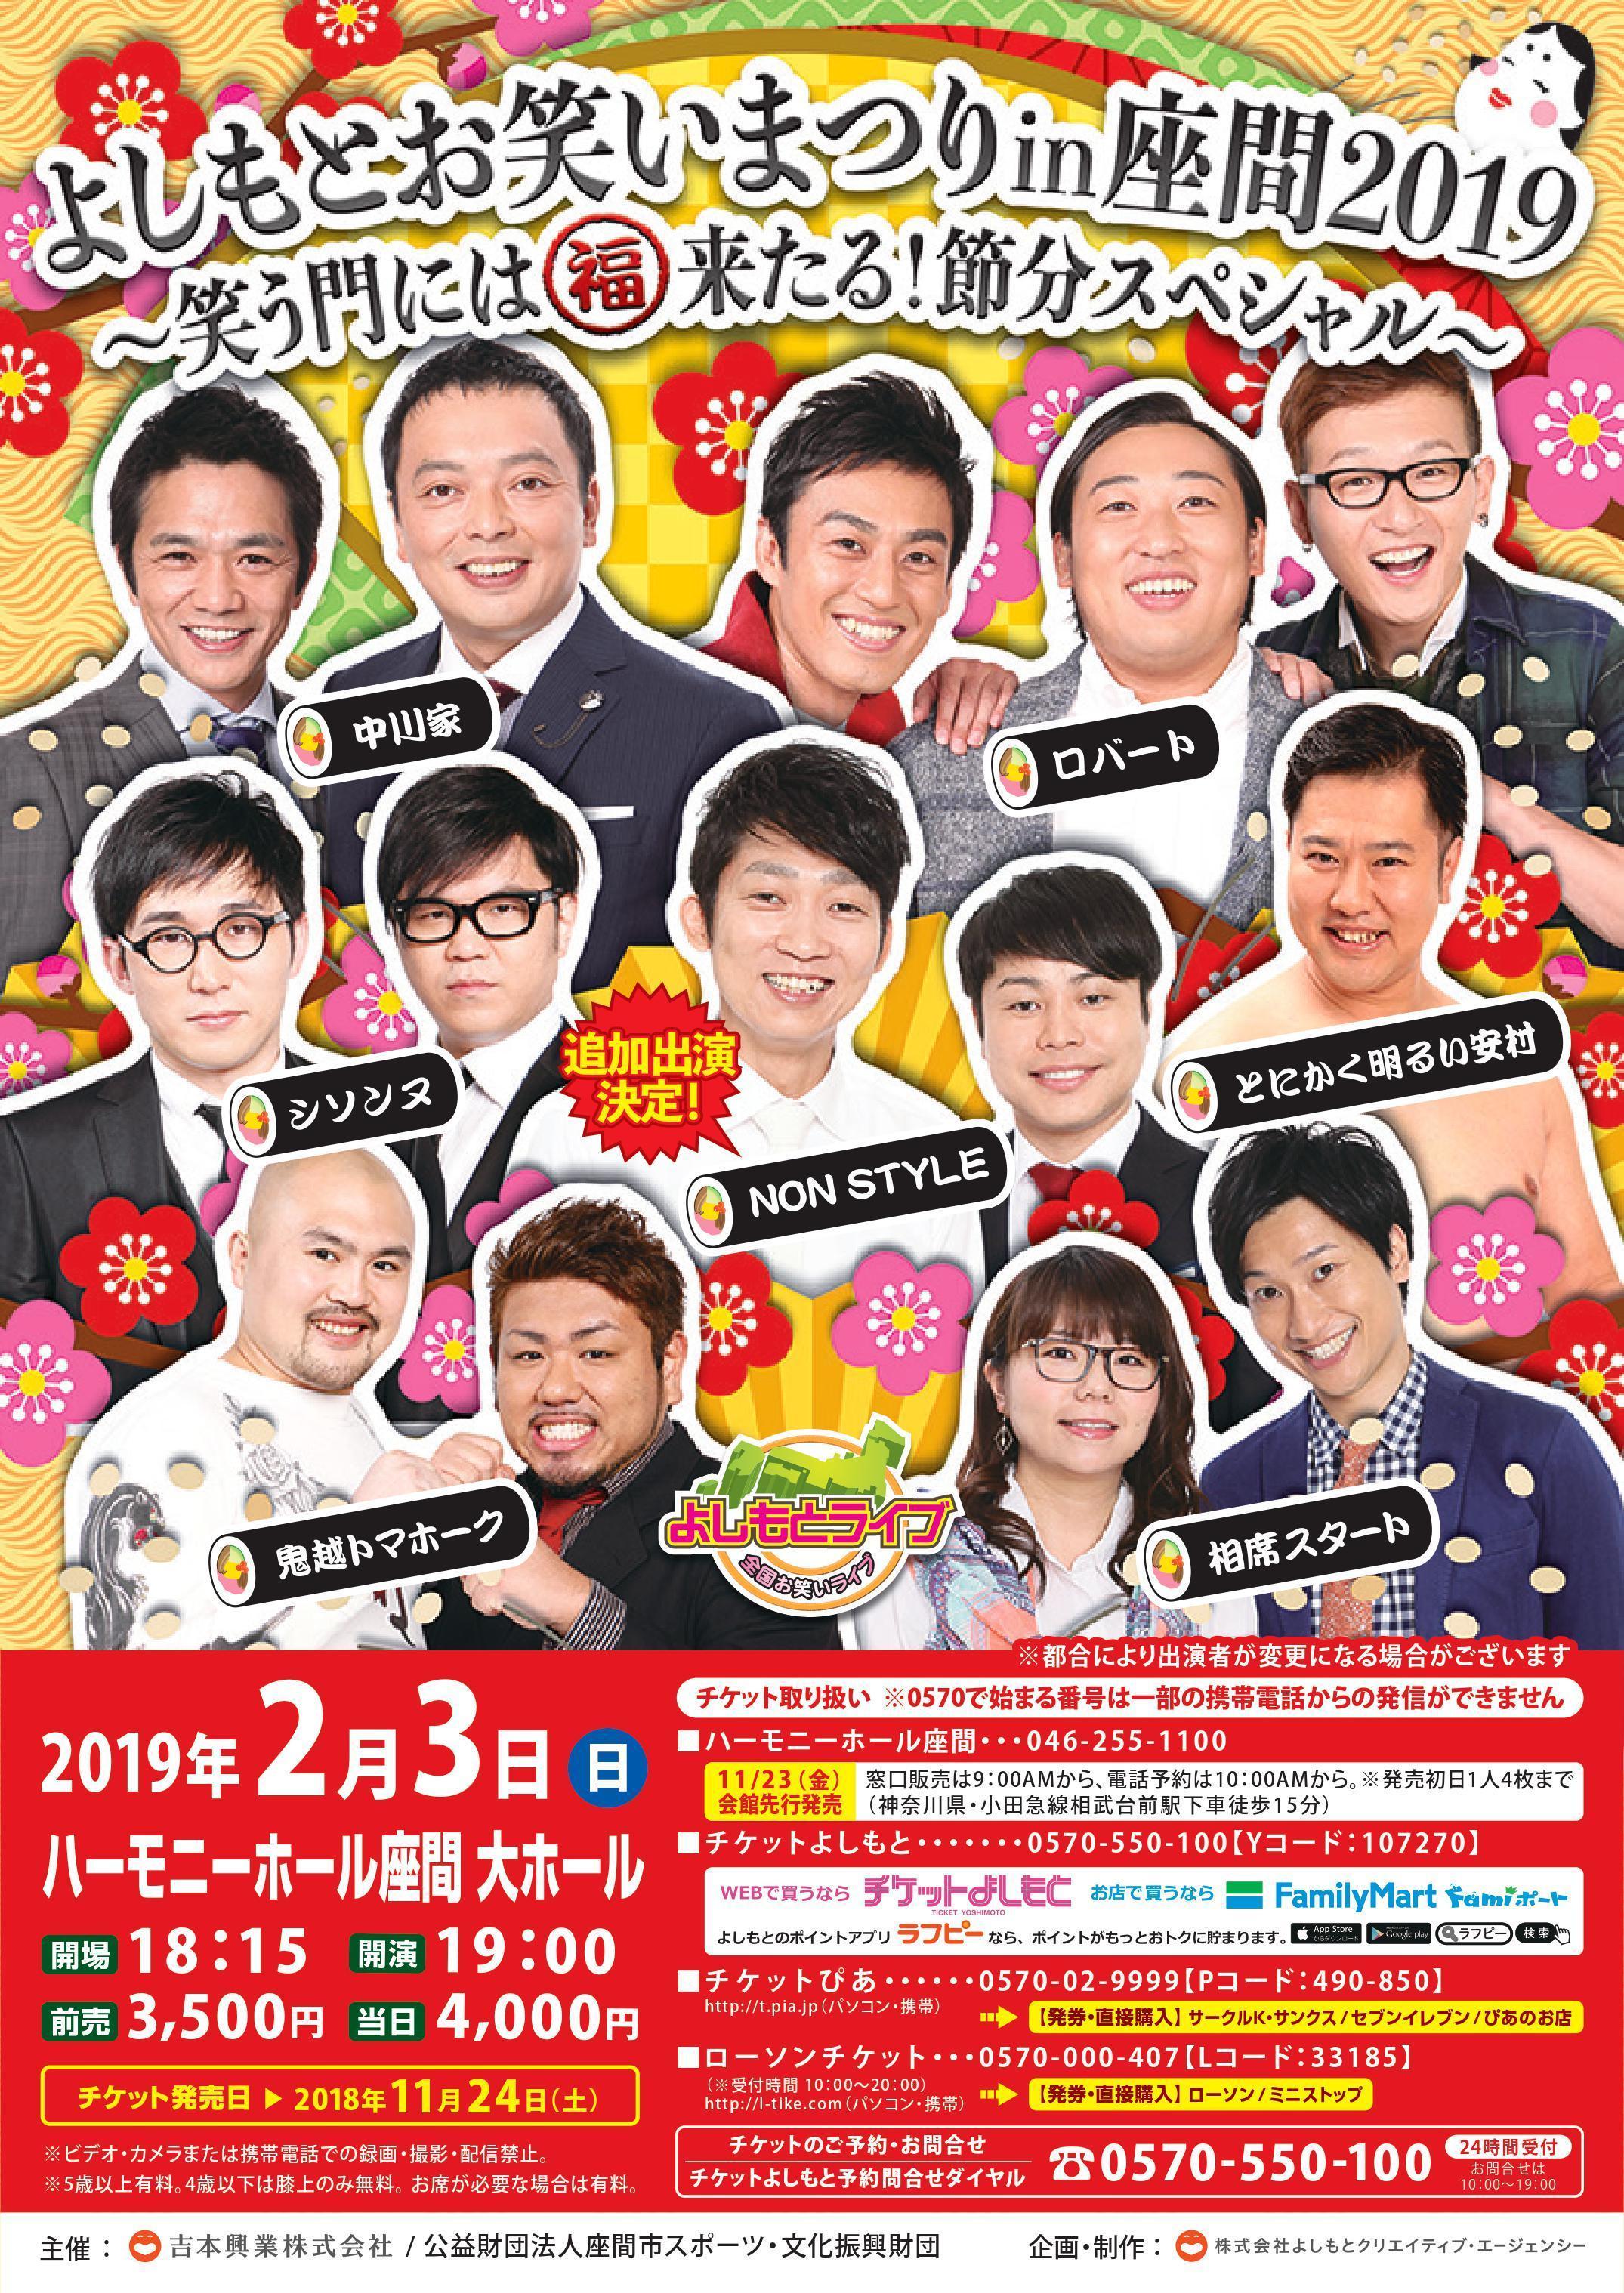 http://www.syumatsu.jp/20190111000938-13ad38e69732e187129400a6d4c619571974808f.jpg